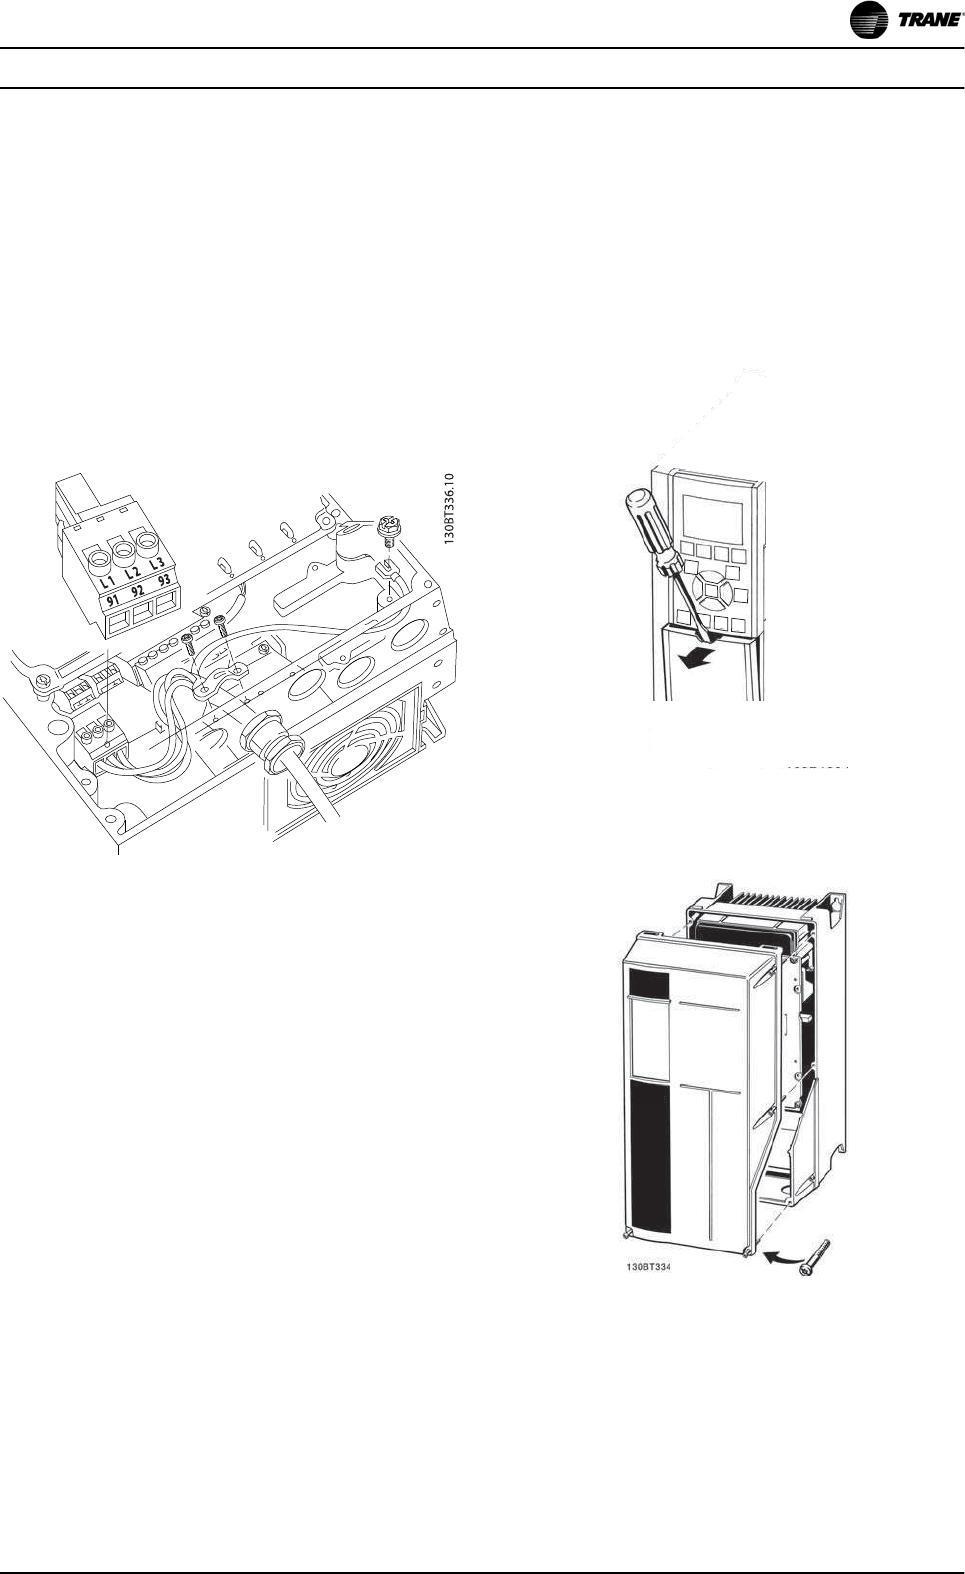 Trane BAS-SVX19D-EN Installation And Operation Download